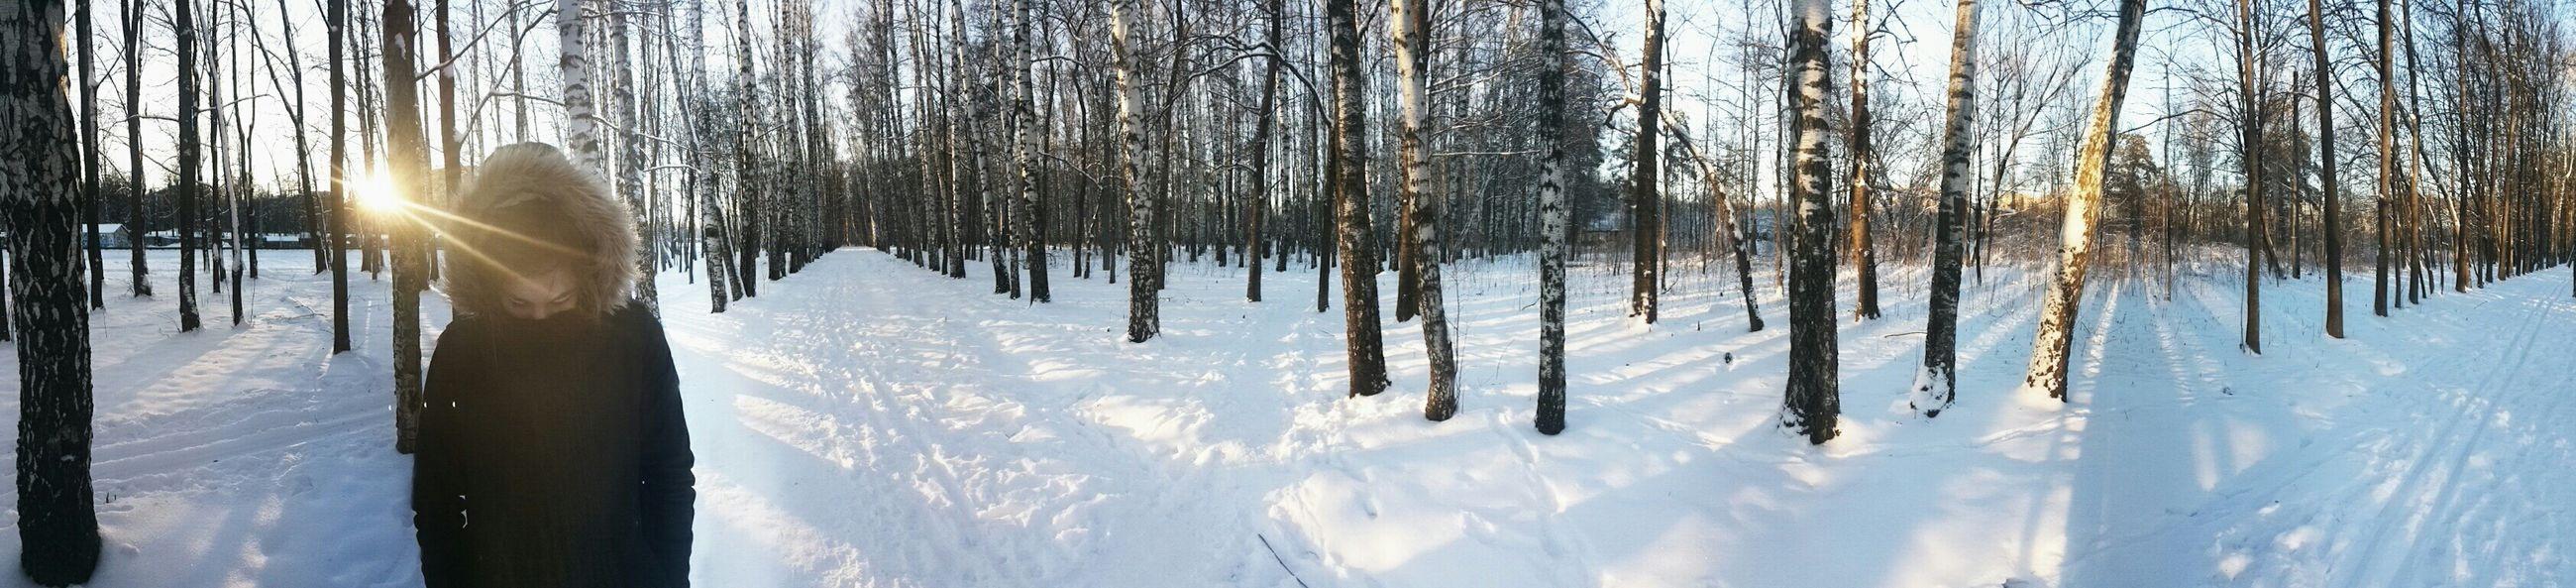 Sky Winter In The Forest Girlfriend